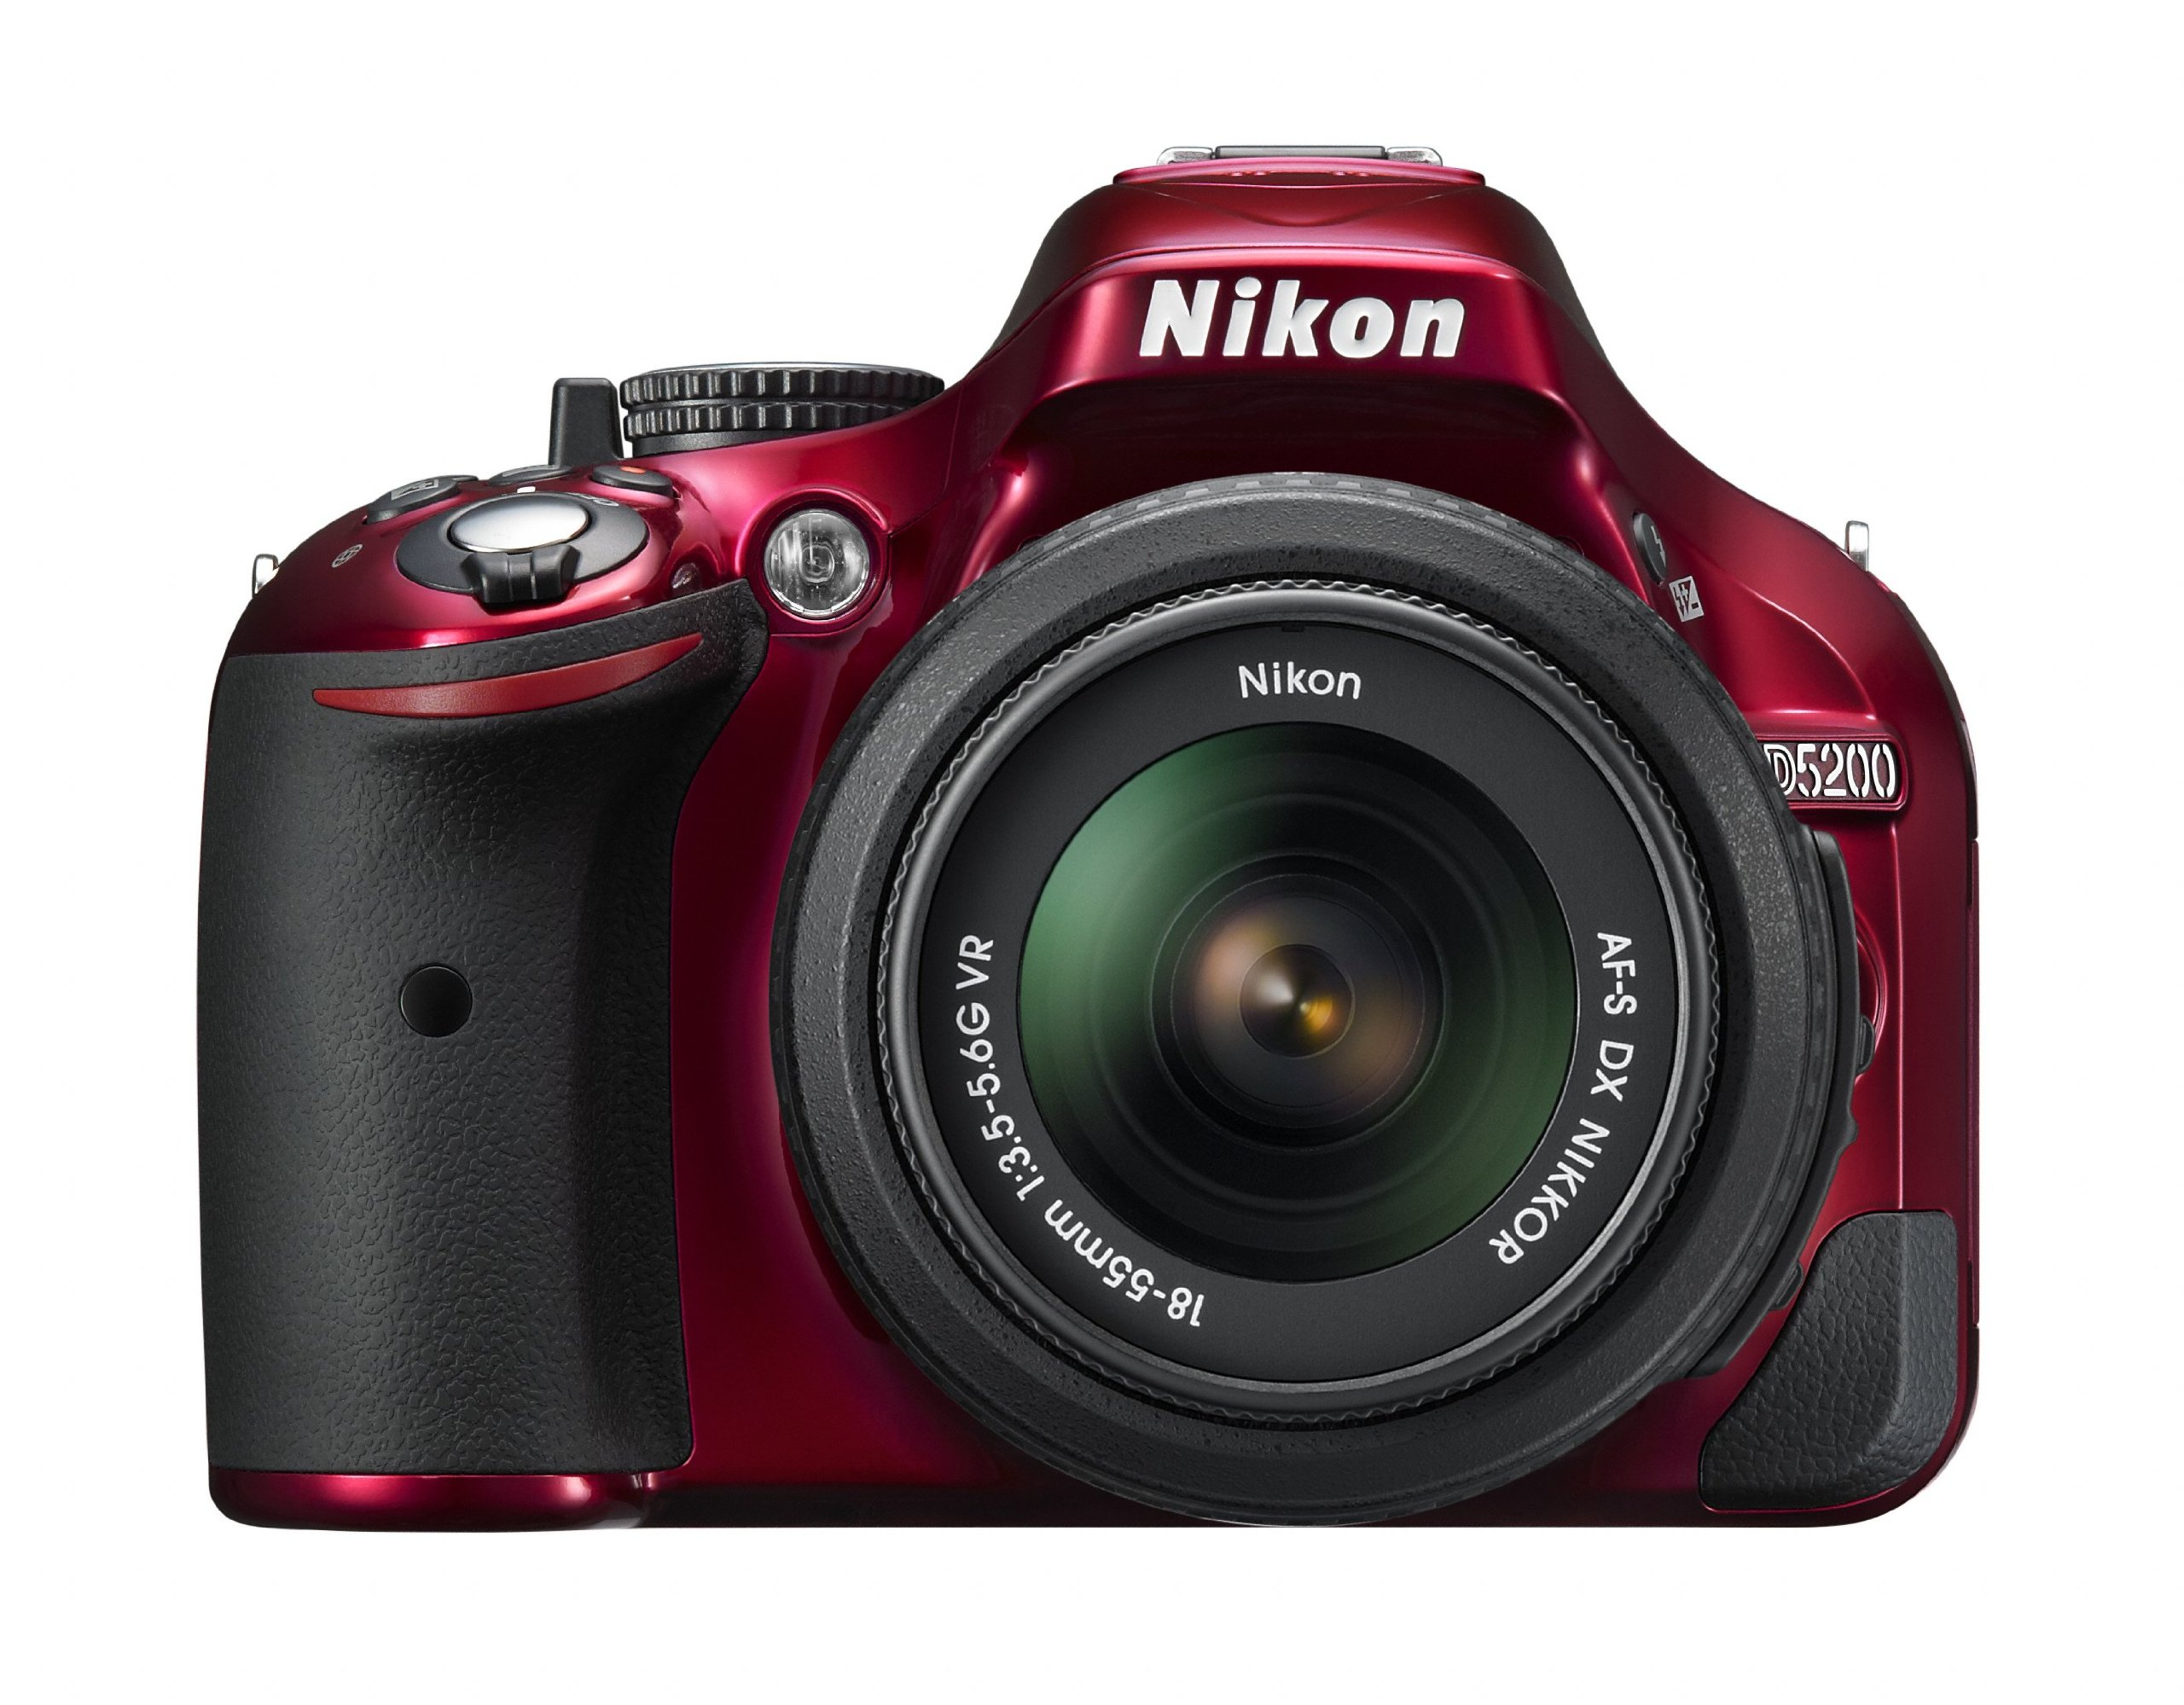 Nikon デジタル一眼レフカメラ D5200 レンズキット AF-S DX NIKKOR 18-55mm f/3.5-5.6G VR付属 レッド D5200LKRD product image